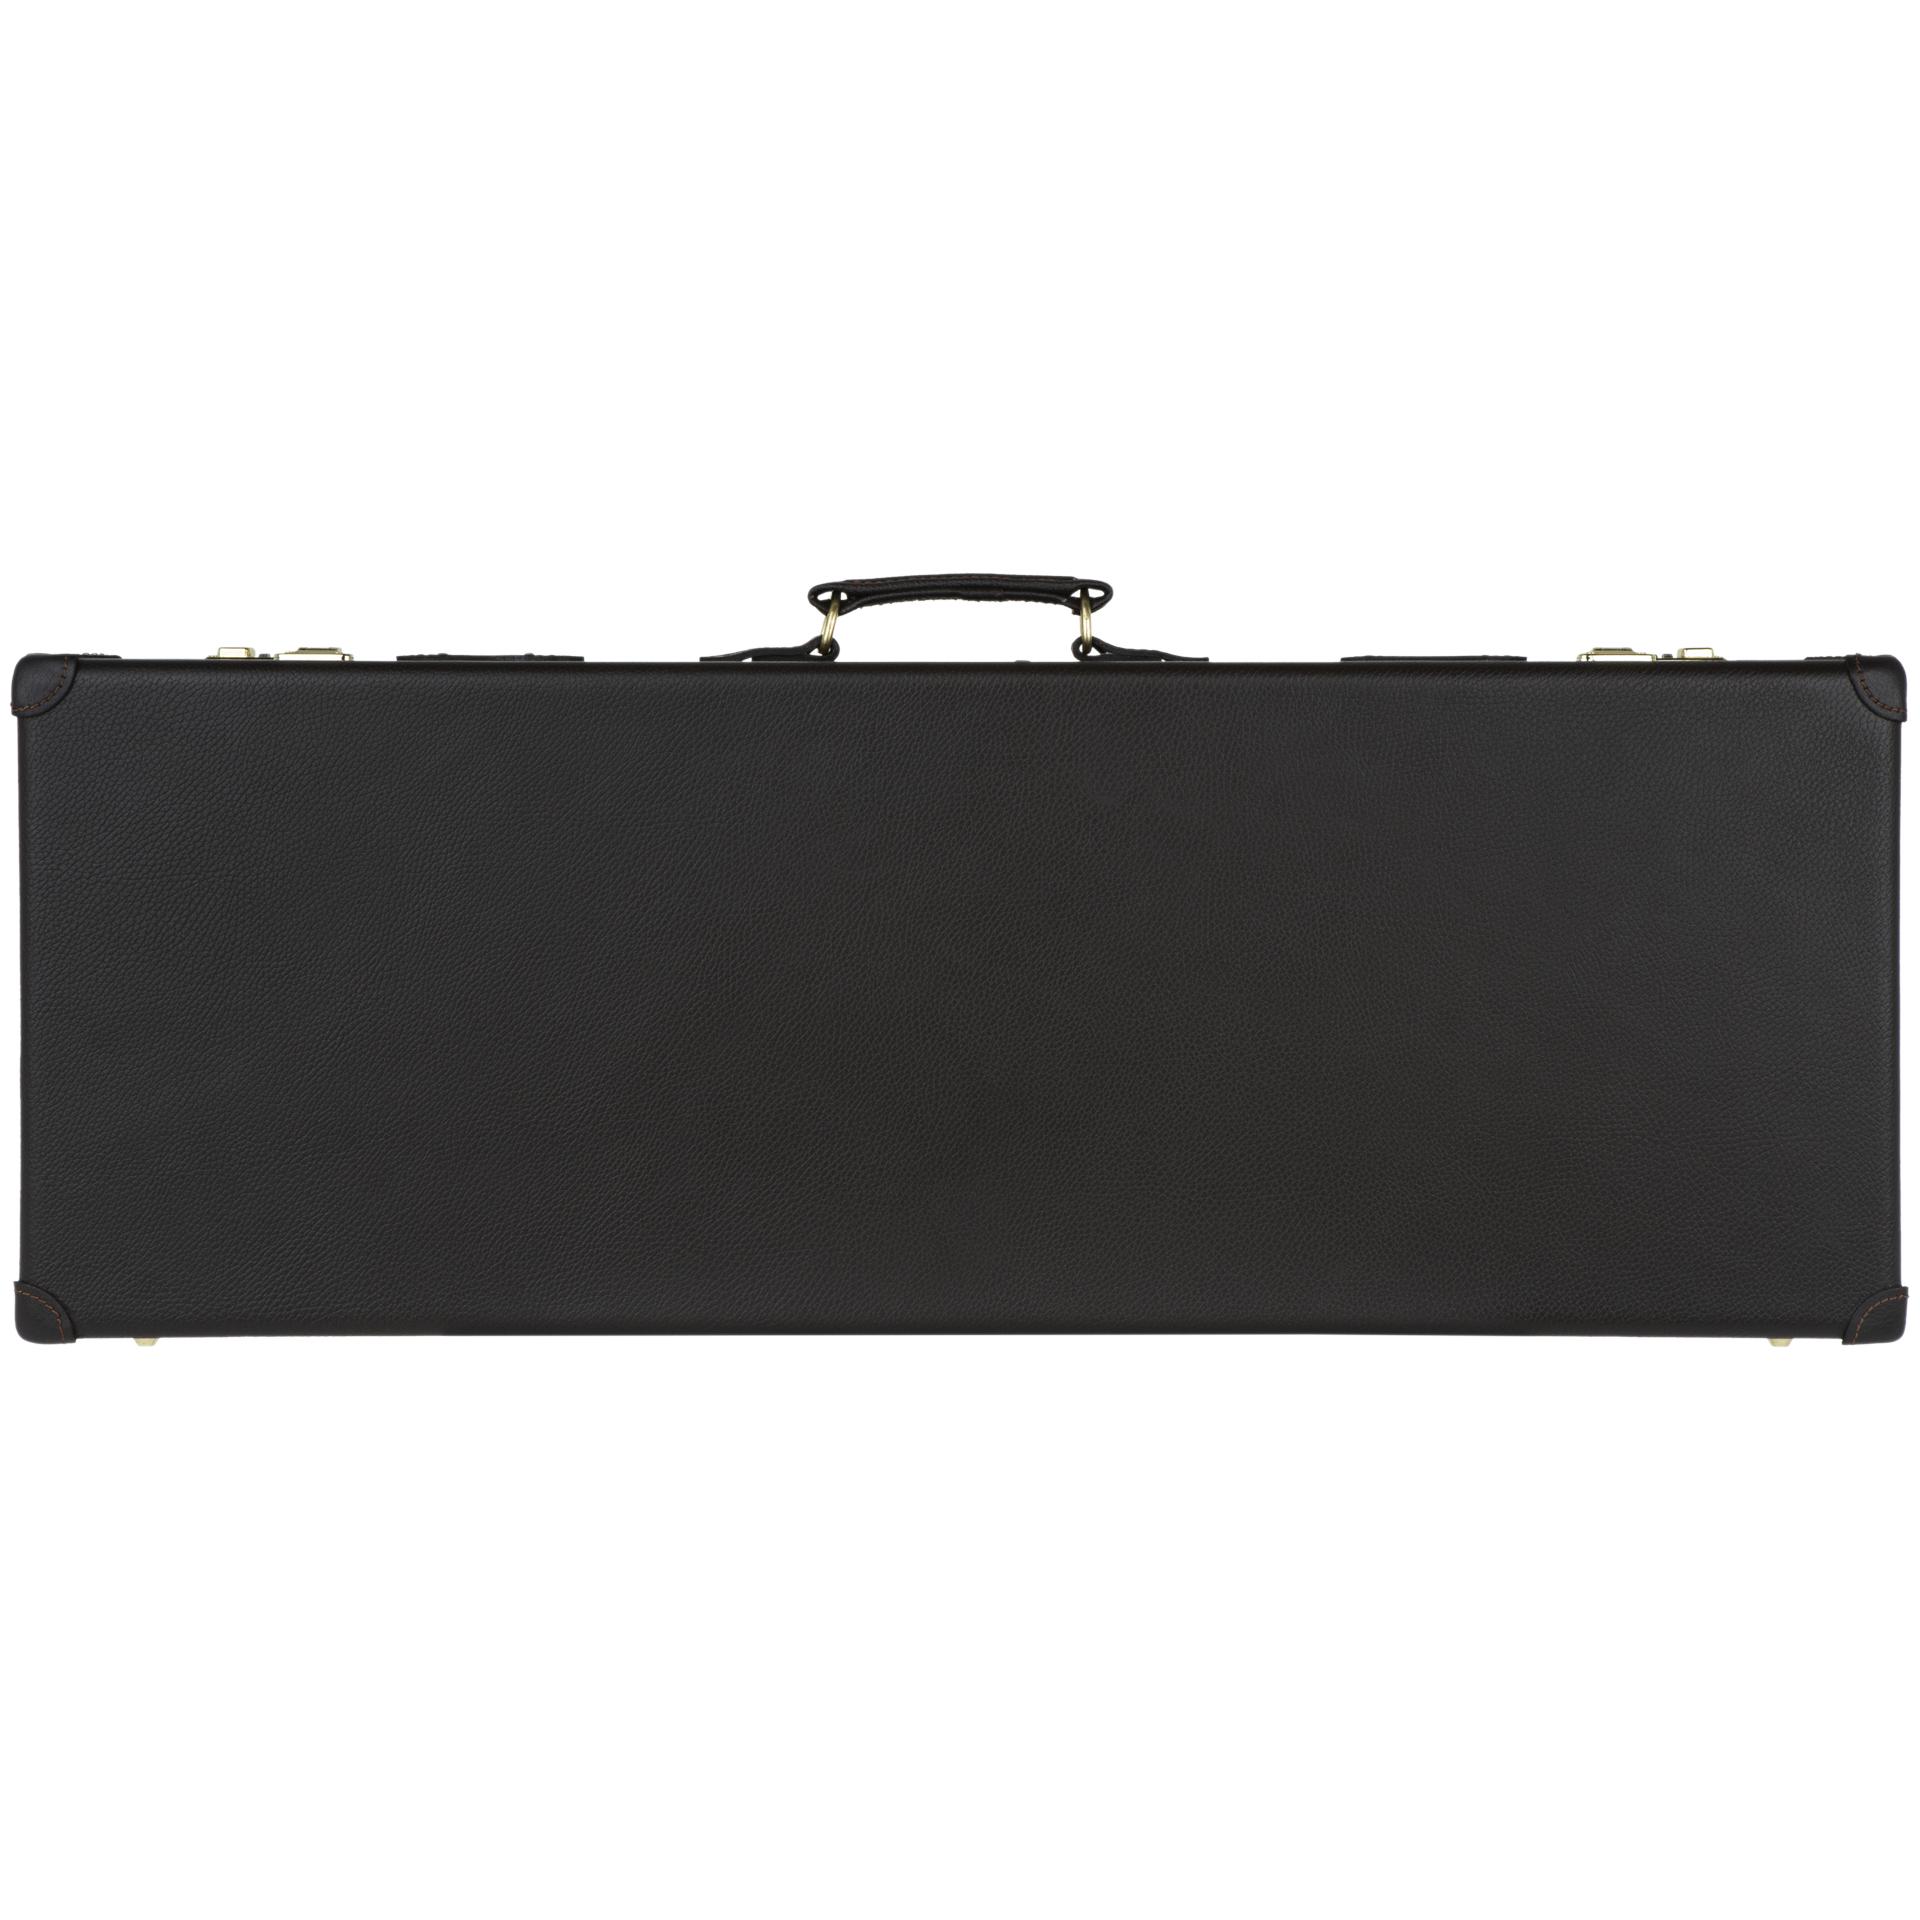 BERETTA Hard Leather Case For Standard Beretta Shotguns (SVPD108)